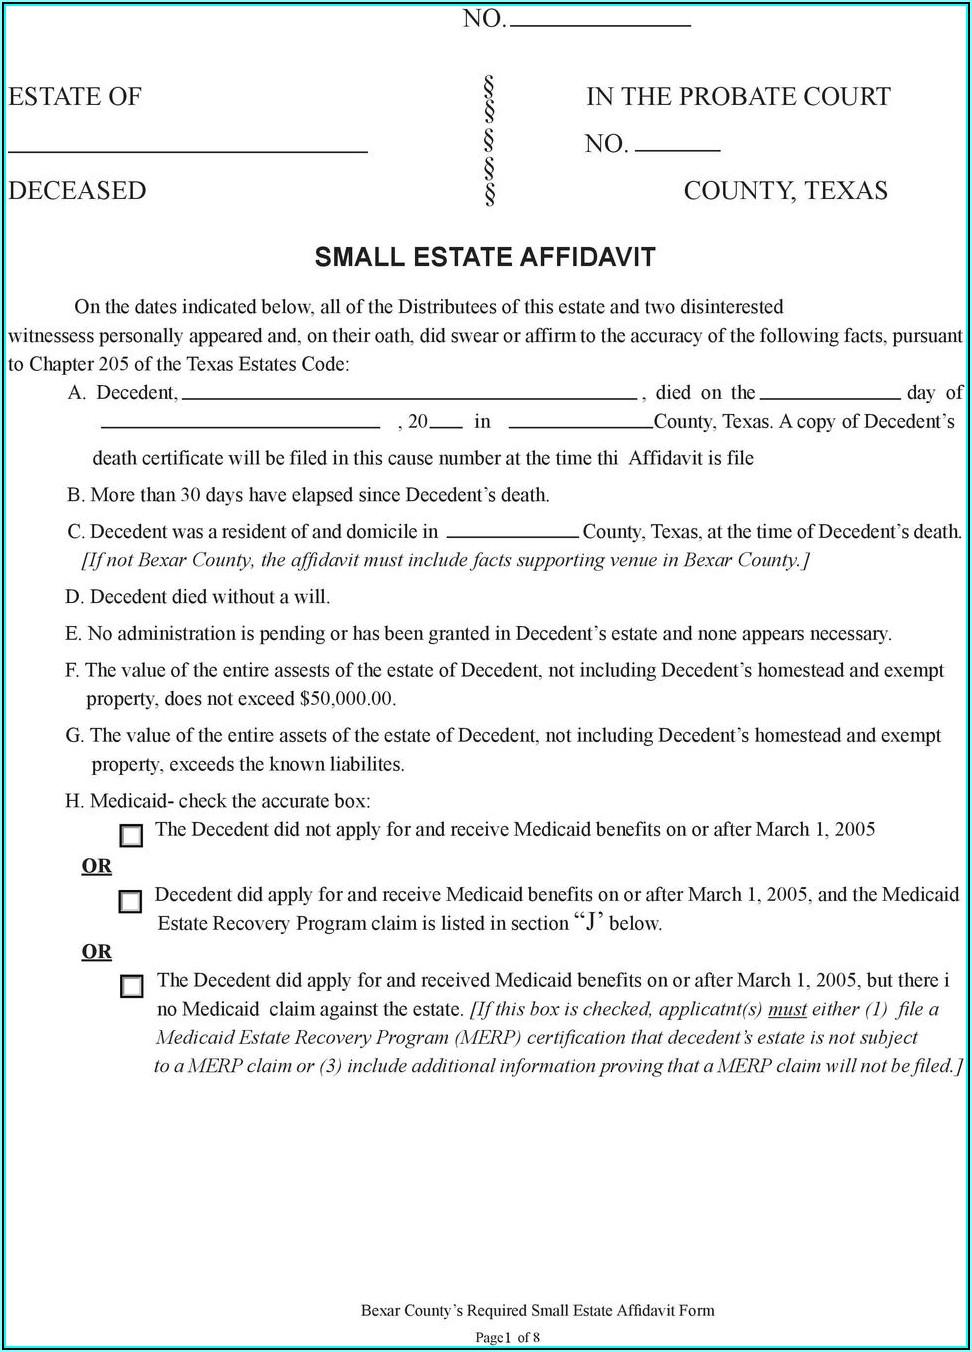 Small Estate Affidavit Form Bexar County Texas